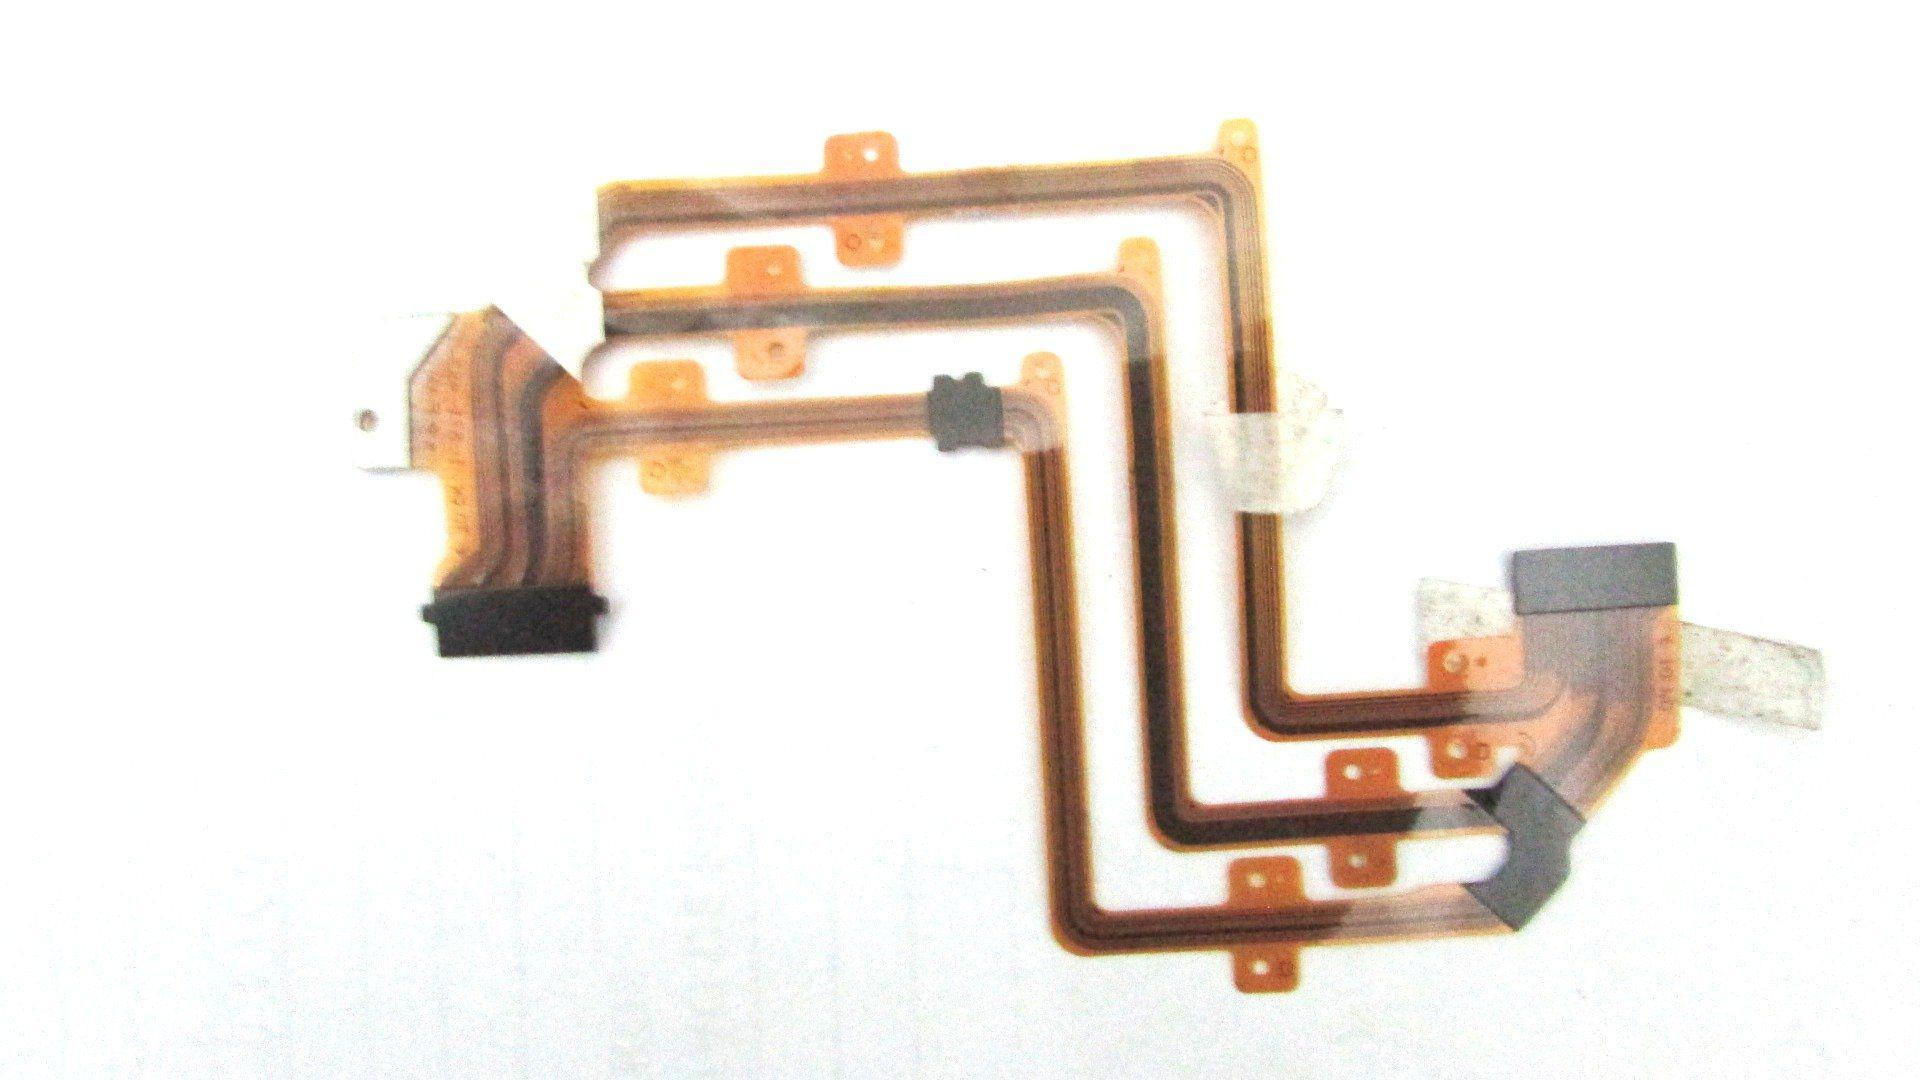 CABO DA FILE SONY DCR-SR200 HC3 LCD TELA DOBRADIÇA FLEXÍVEL  1-871-457-11